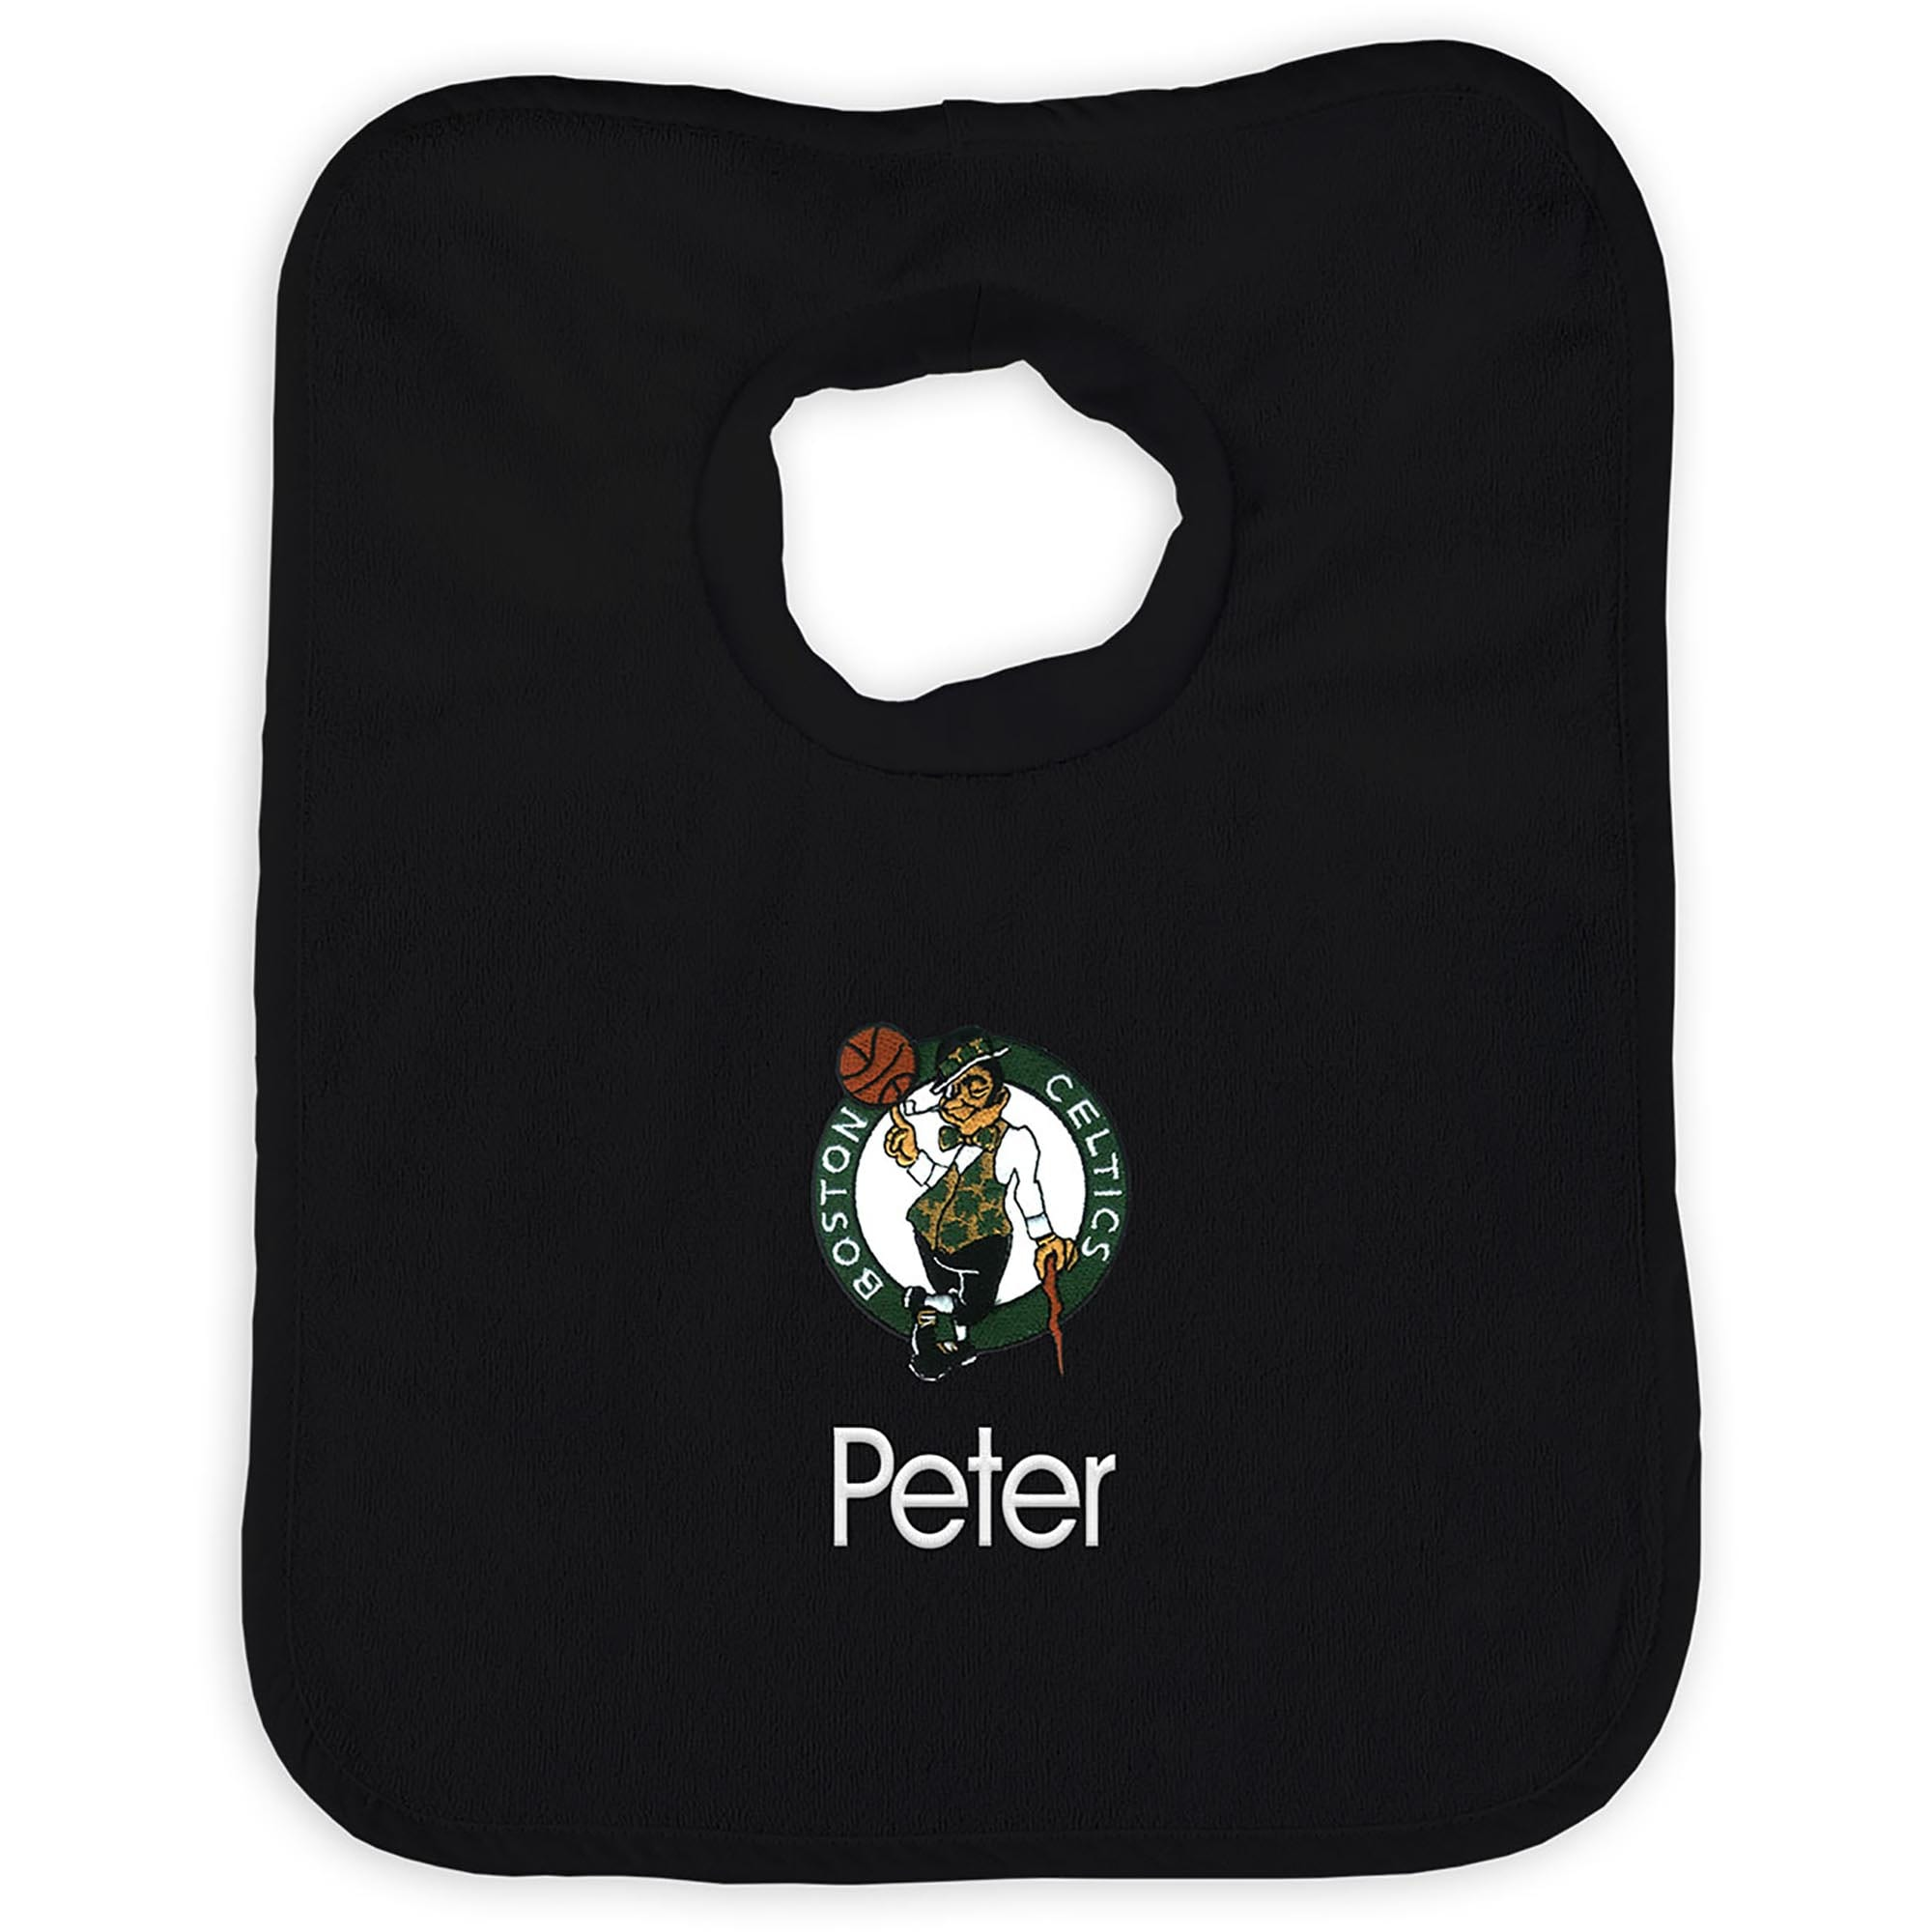 Boston Celtics Infant Personalized Bib - Black